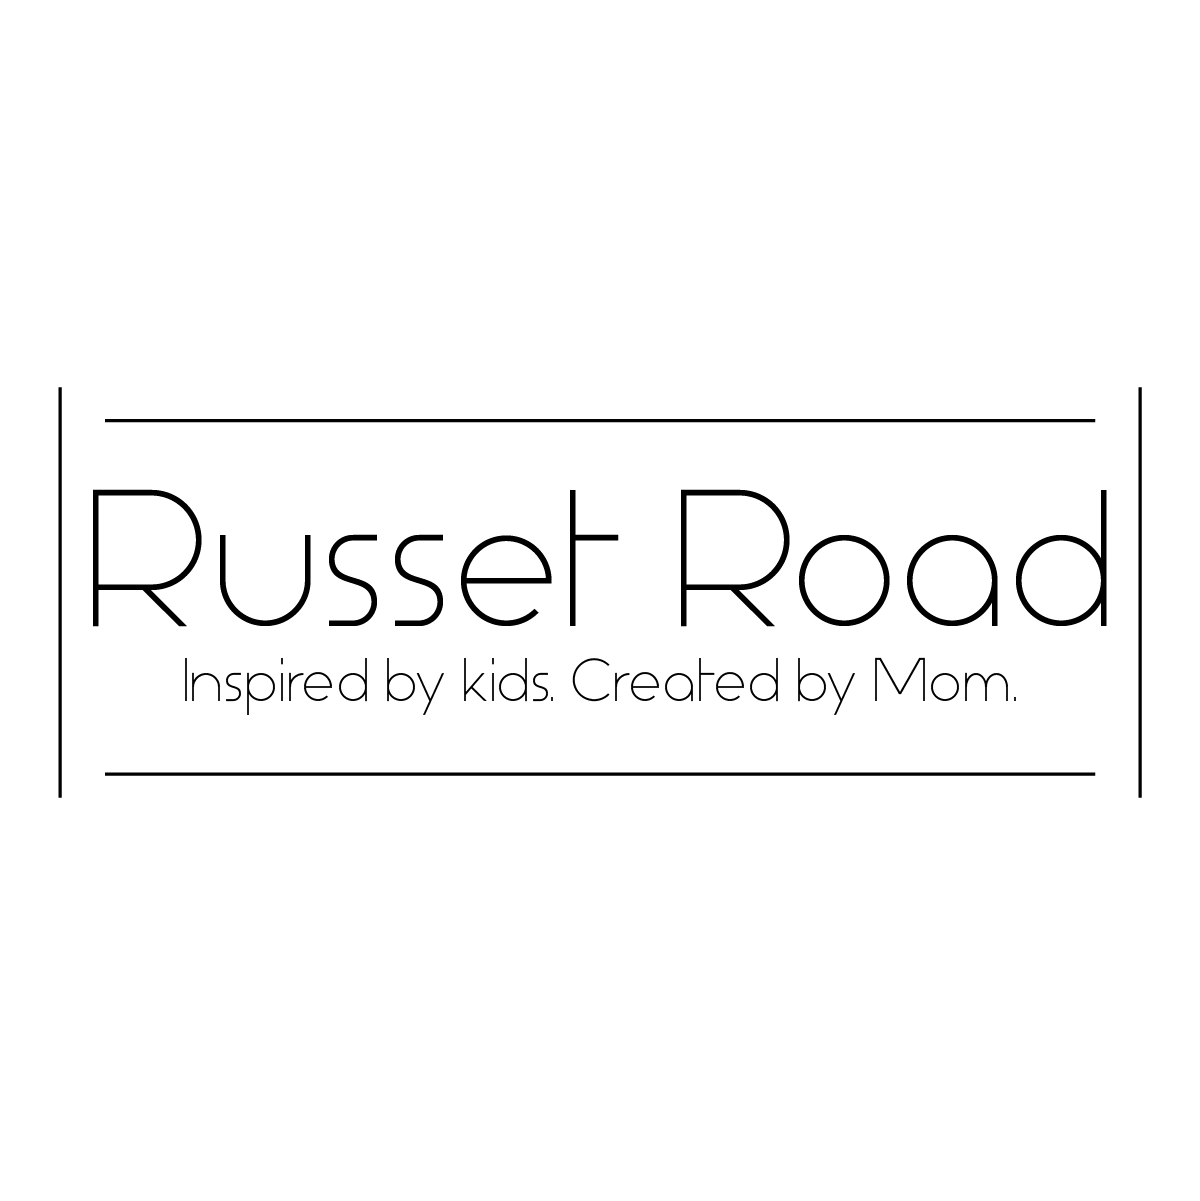 Russet Road logo